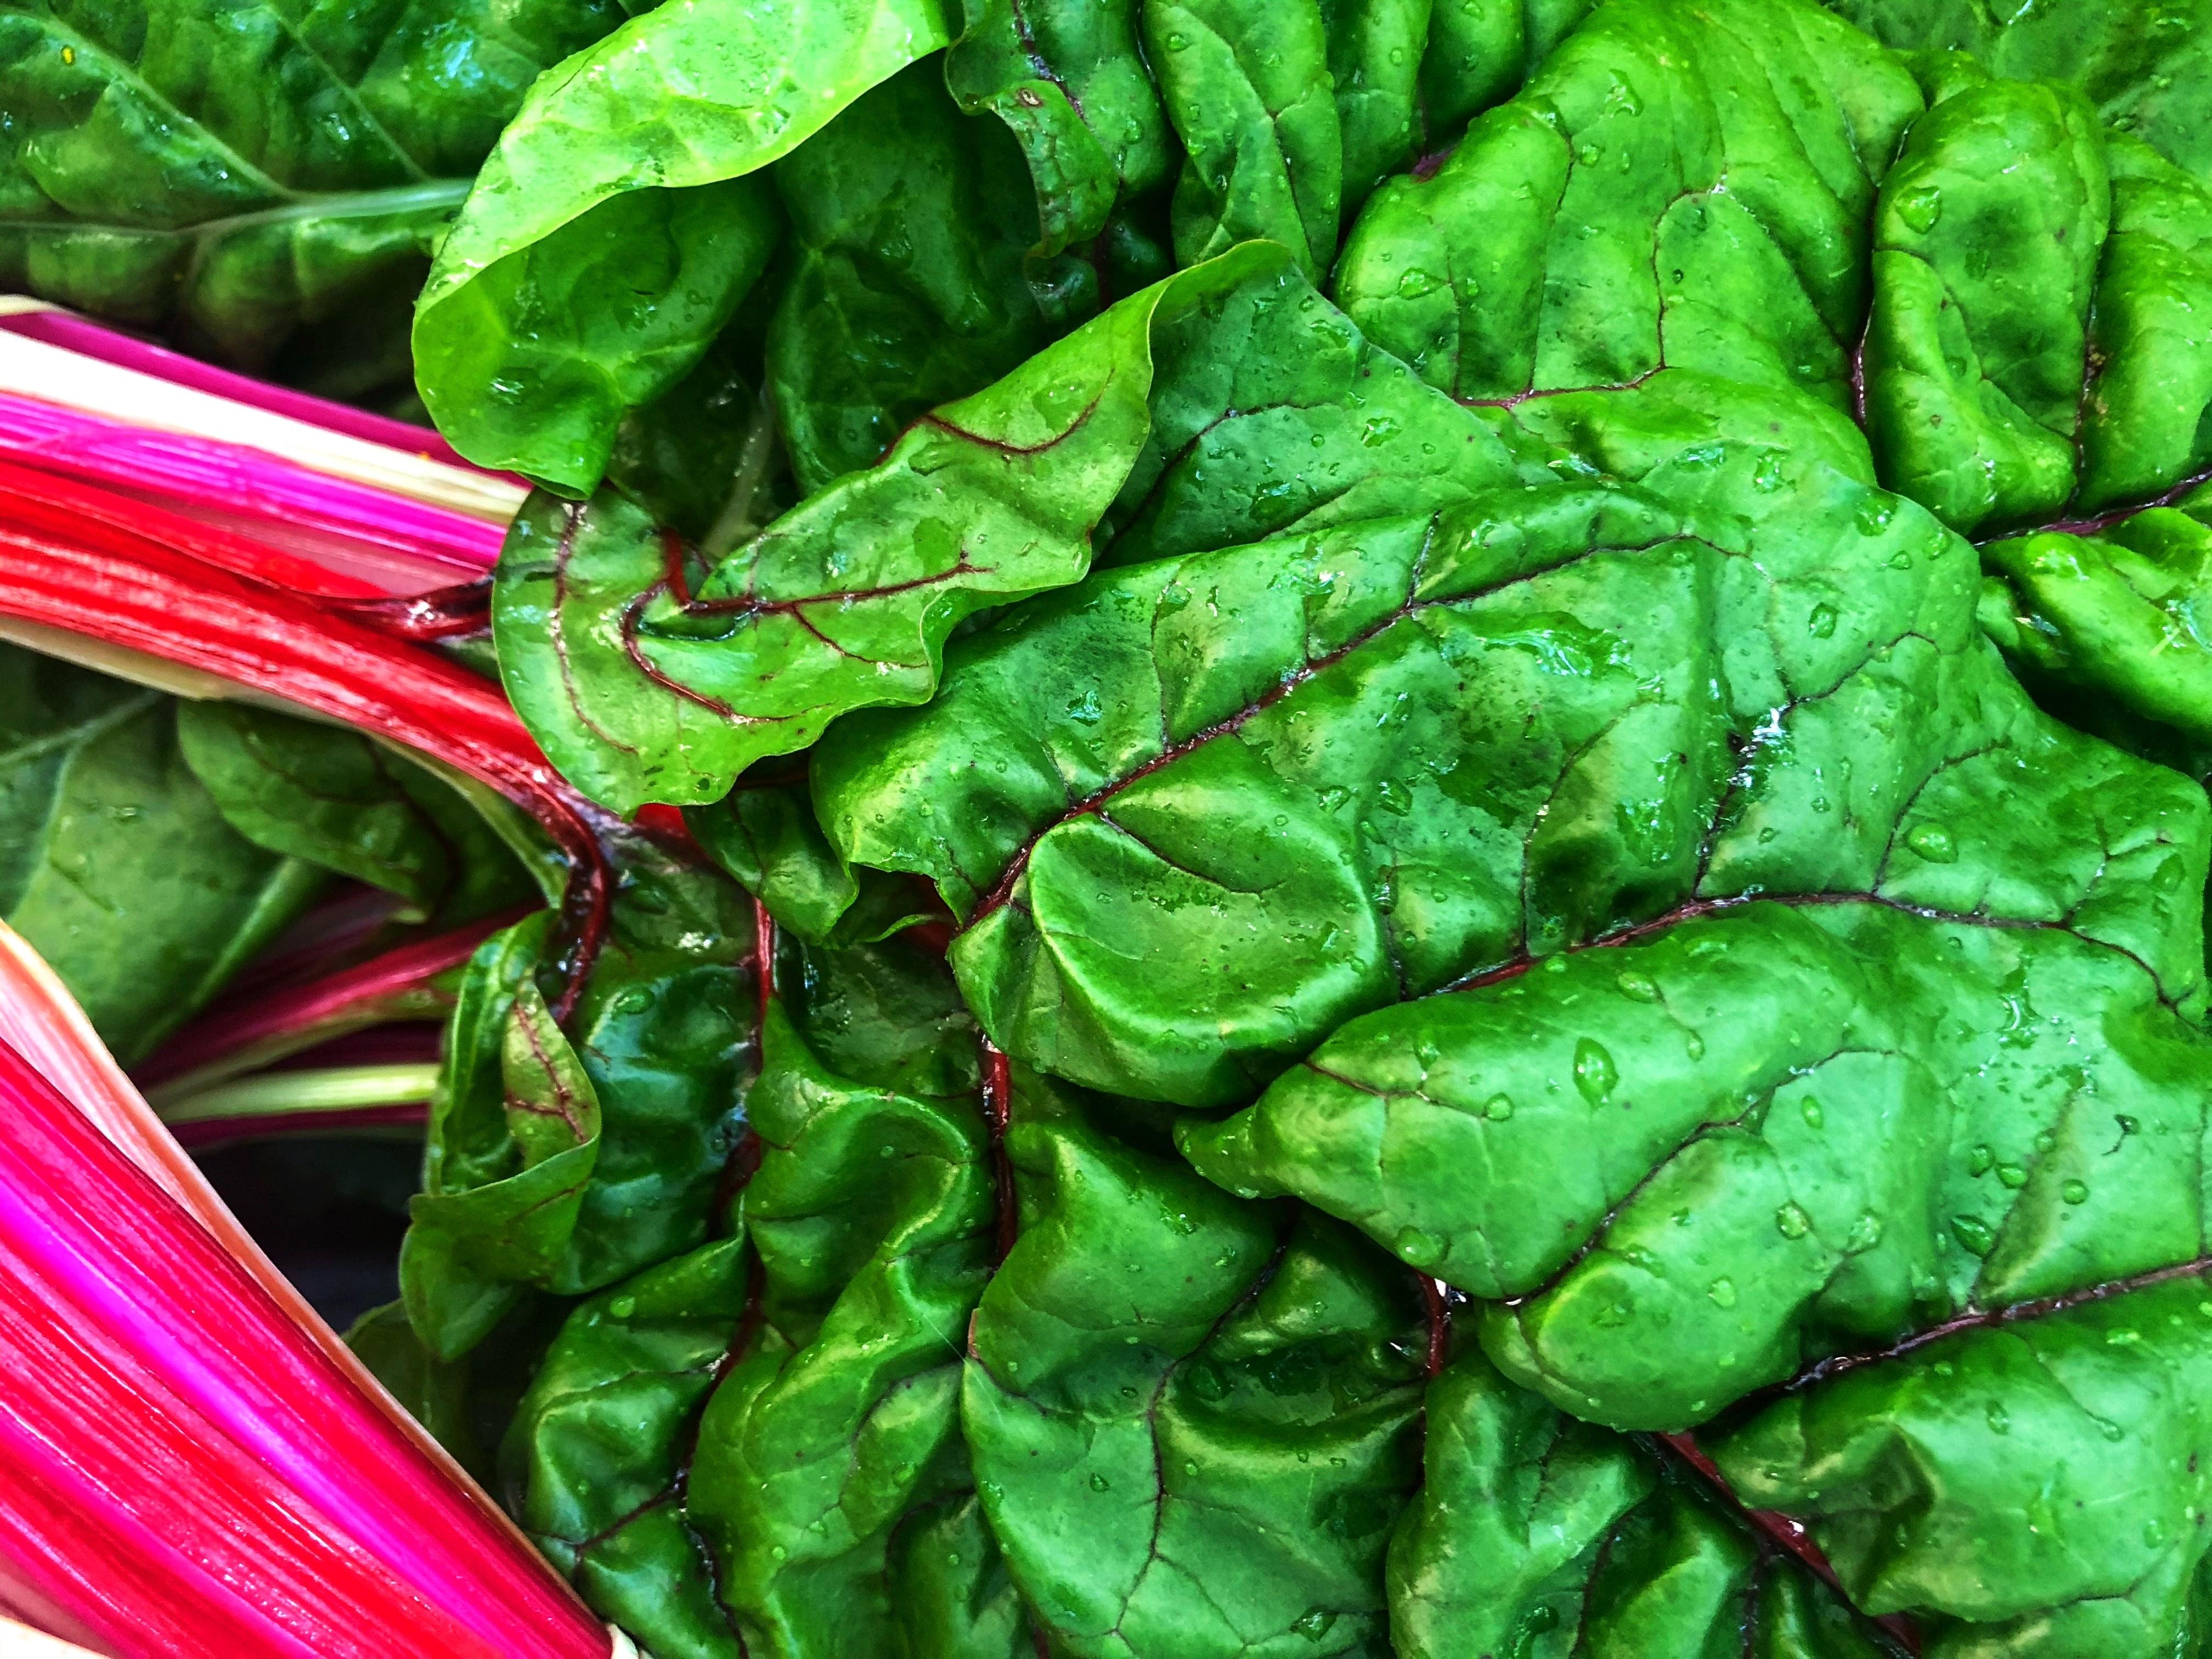 lifestyle home garden nursery plant shop johannesburg gauteng swiss chard vegetables